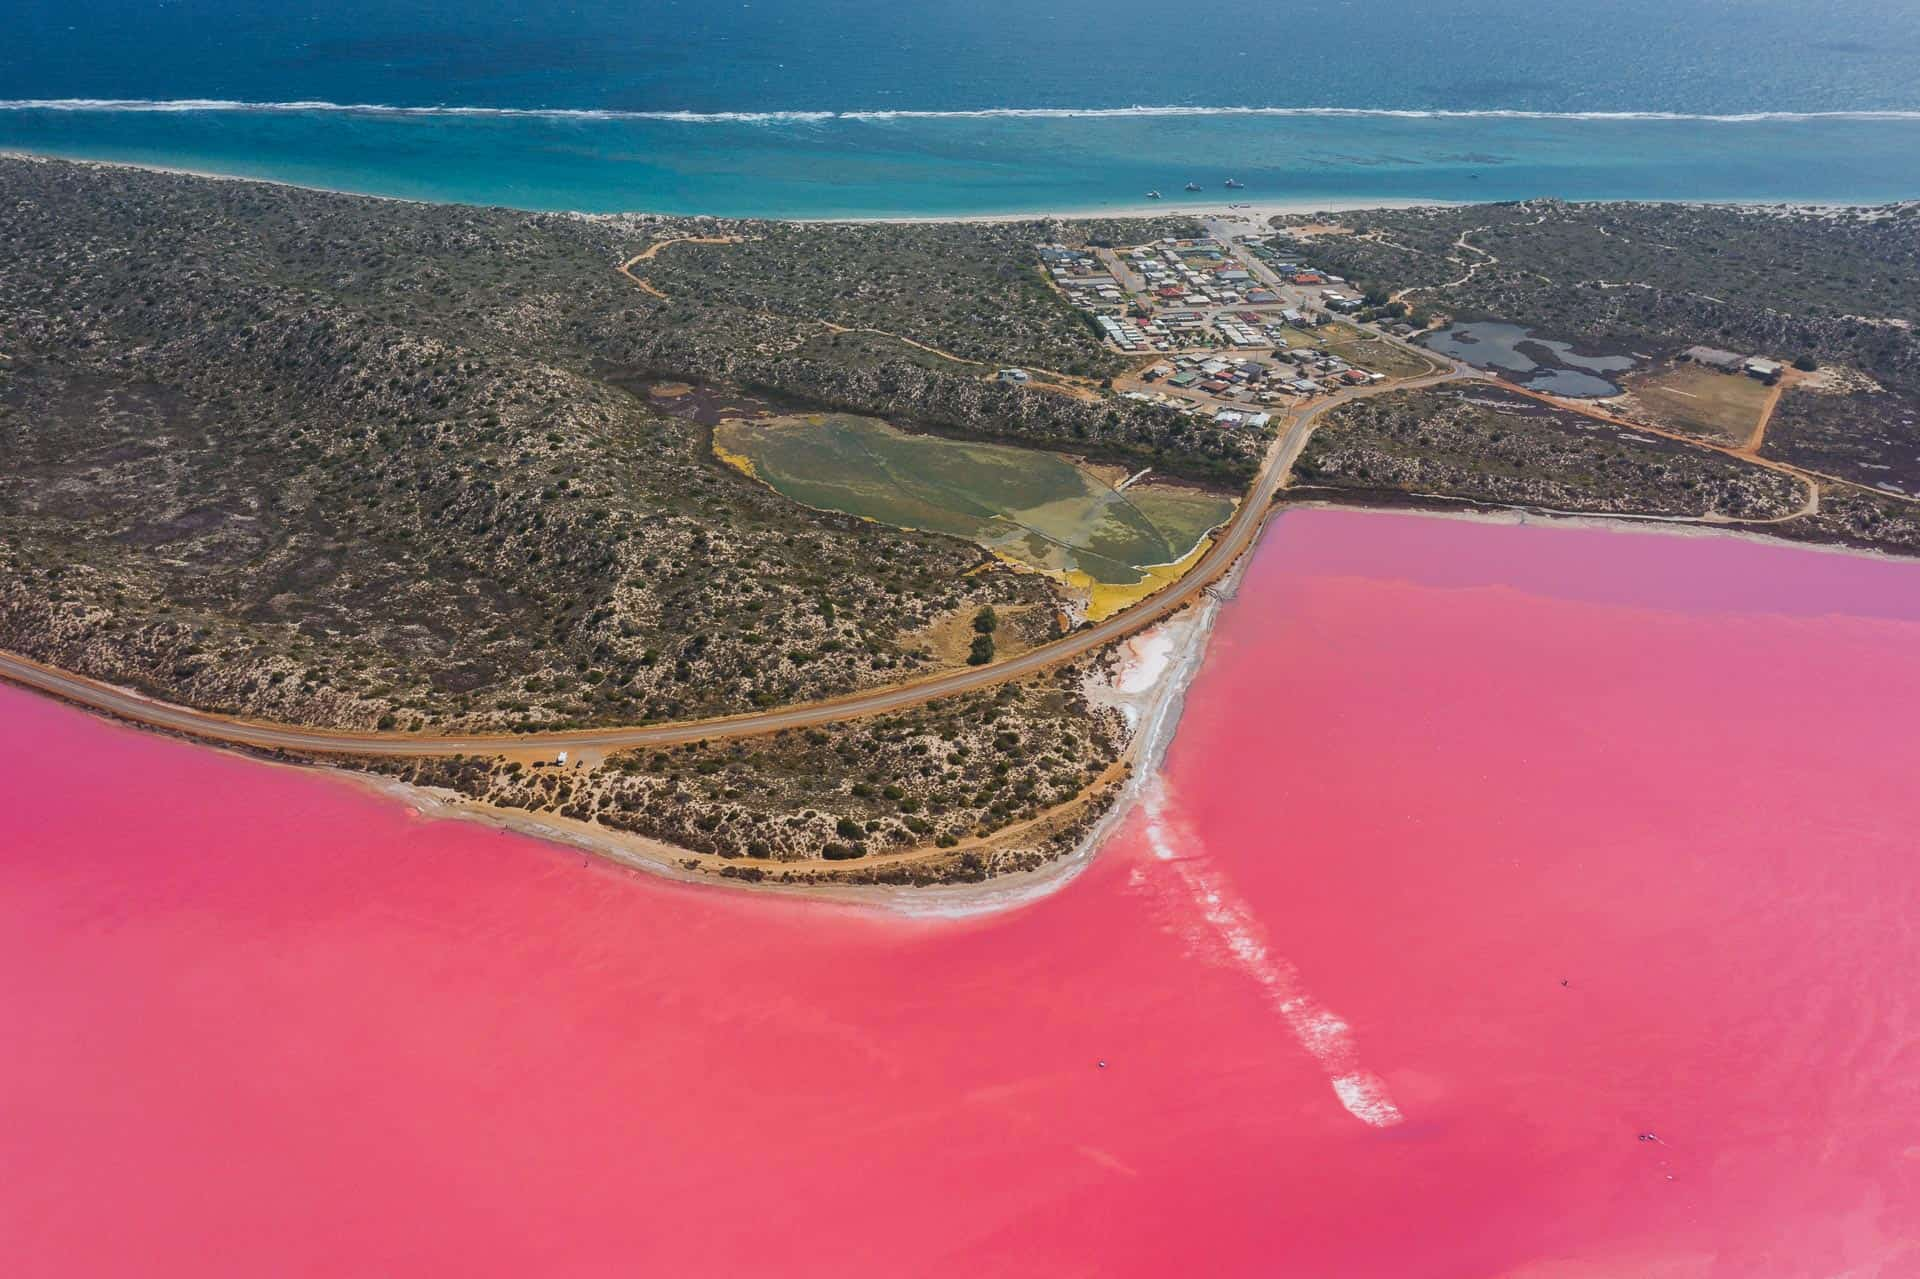 pink lake western australia, hutt lagooon, hutt lagoon pink lake, western australia pink lake, pink lake australia